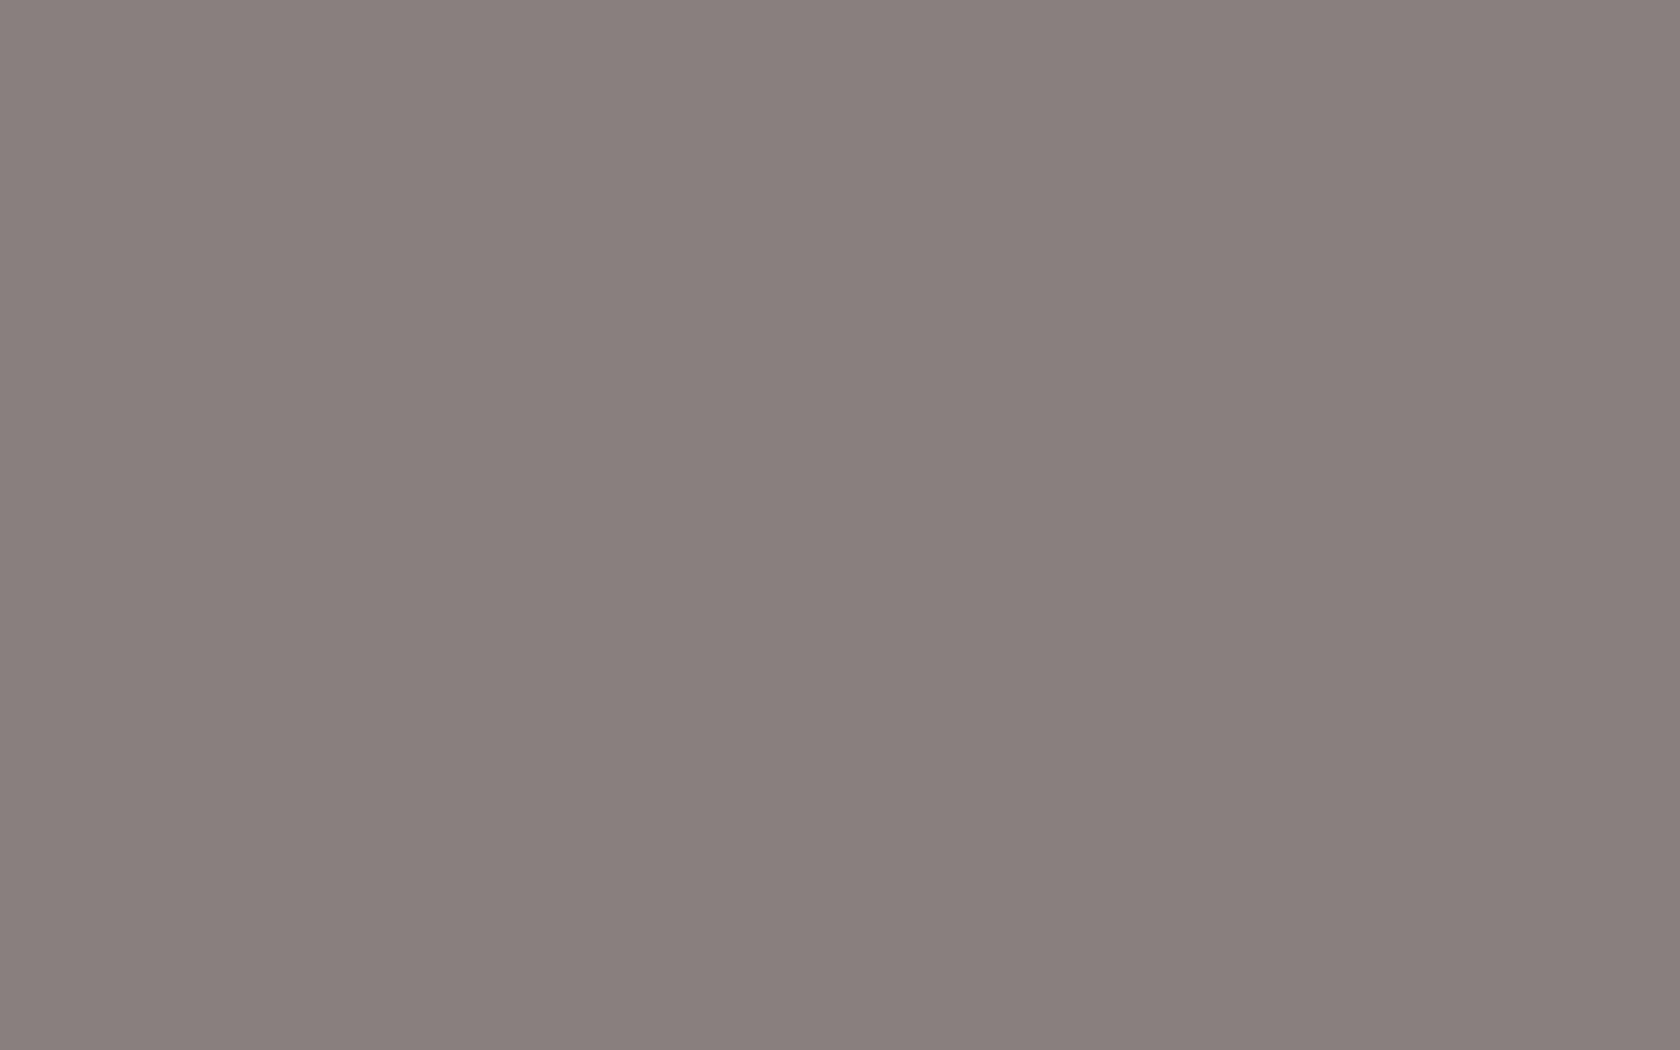 1680x1050 Rocket Metallic Solid Color Background